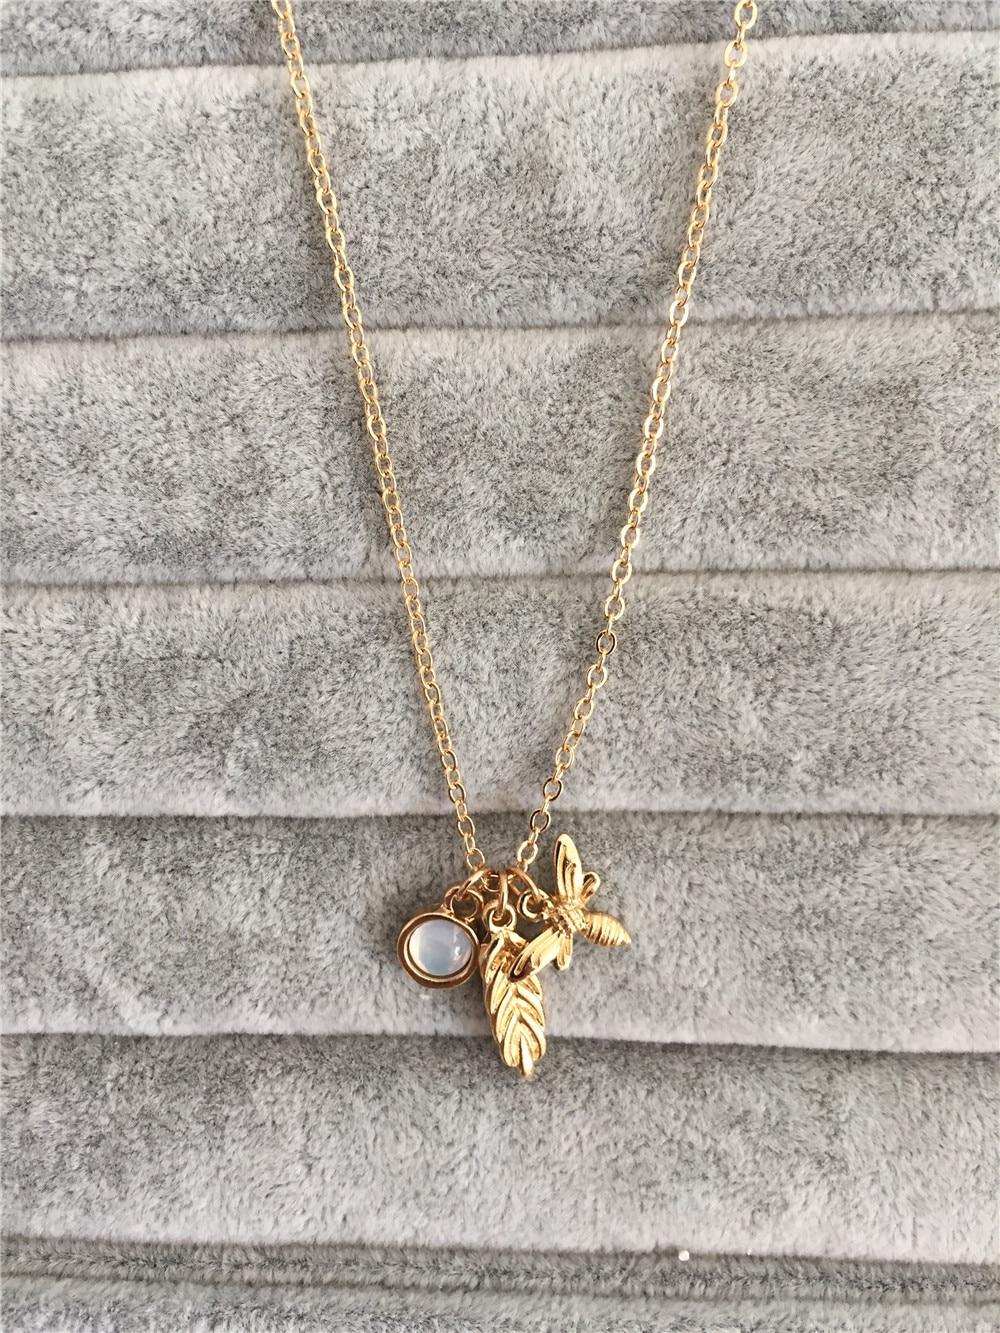 Collier pendentif en pierre de blé dabeille en or